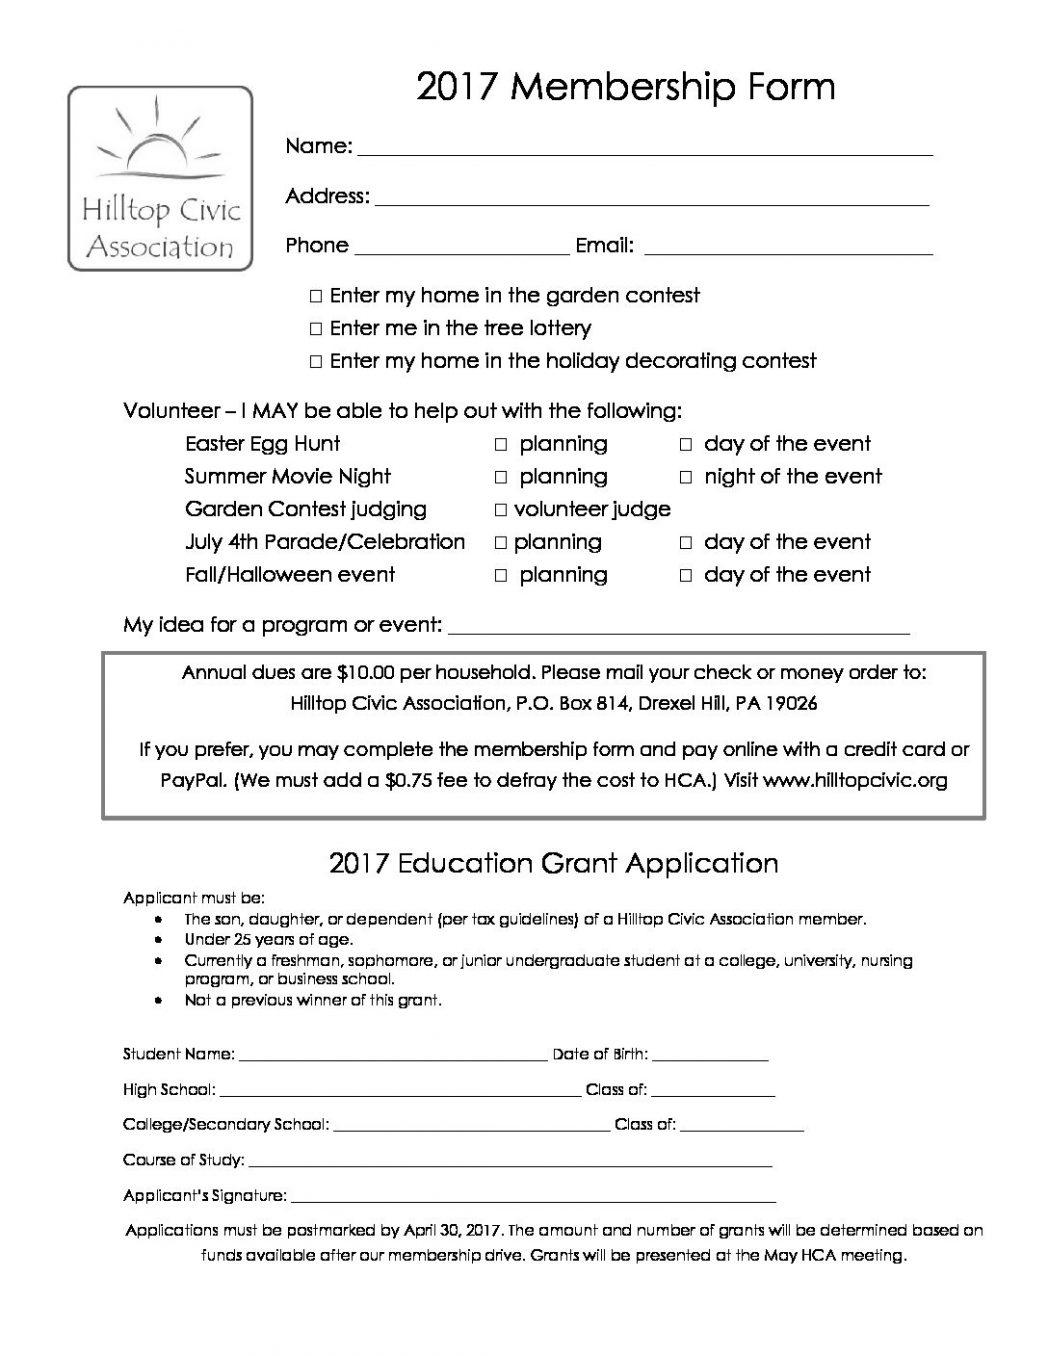 2017 membership form hilltop civic association adriennebailon association membership form sample